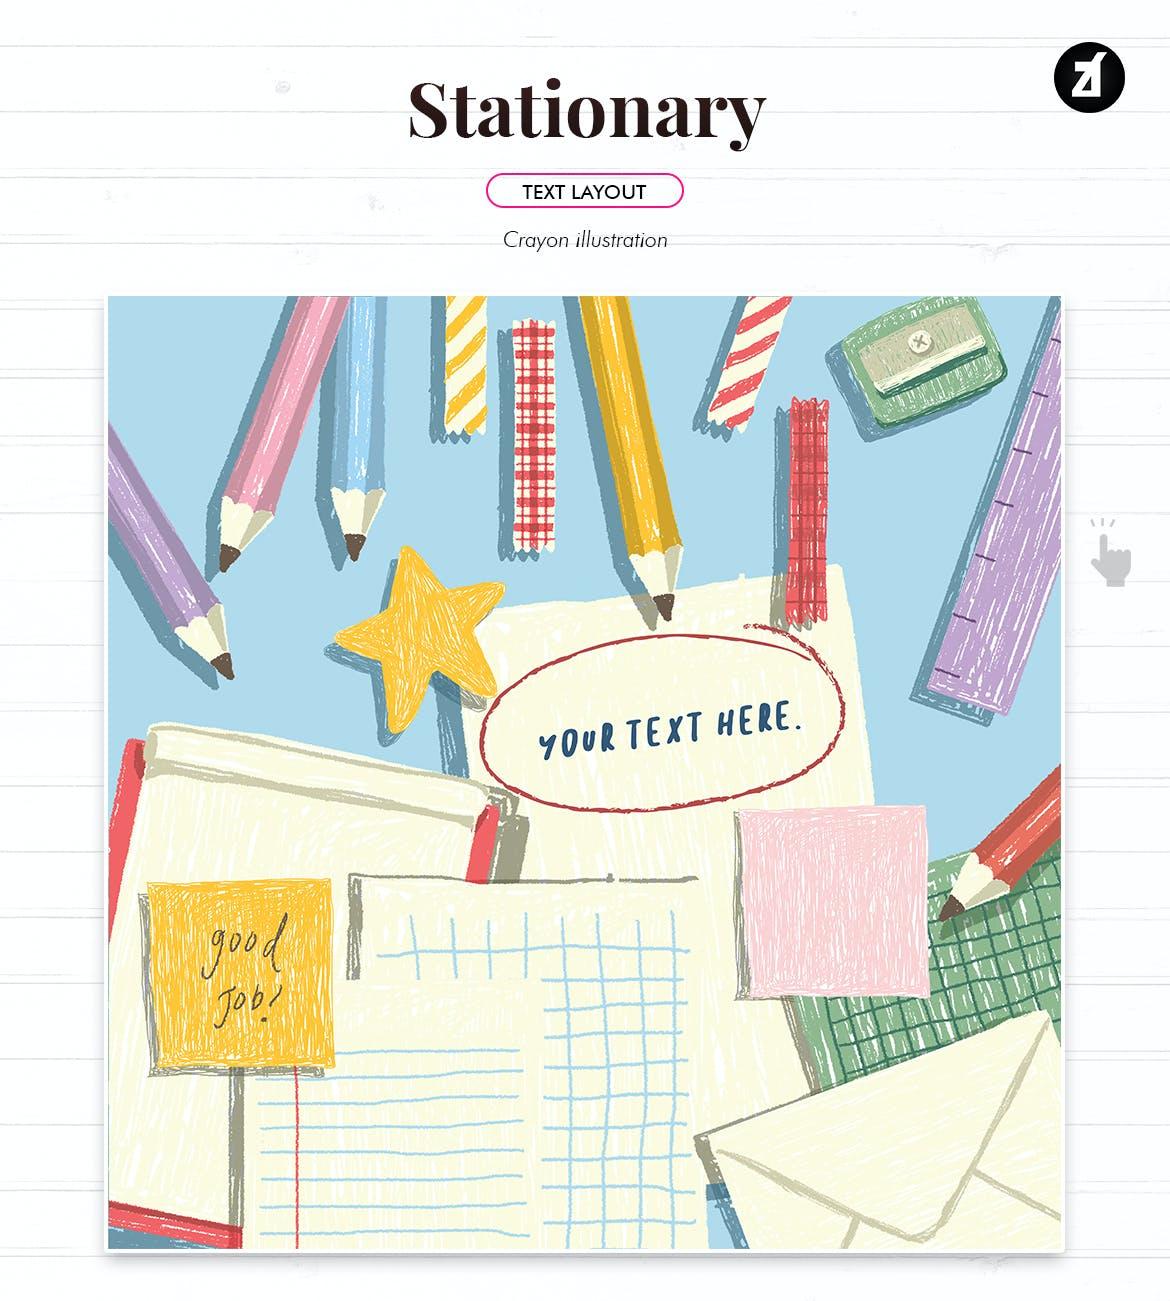 蜡笔绘画效果矢量背景设计素材 Stationary Illustration With Text Layout插图1